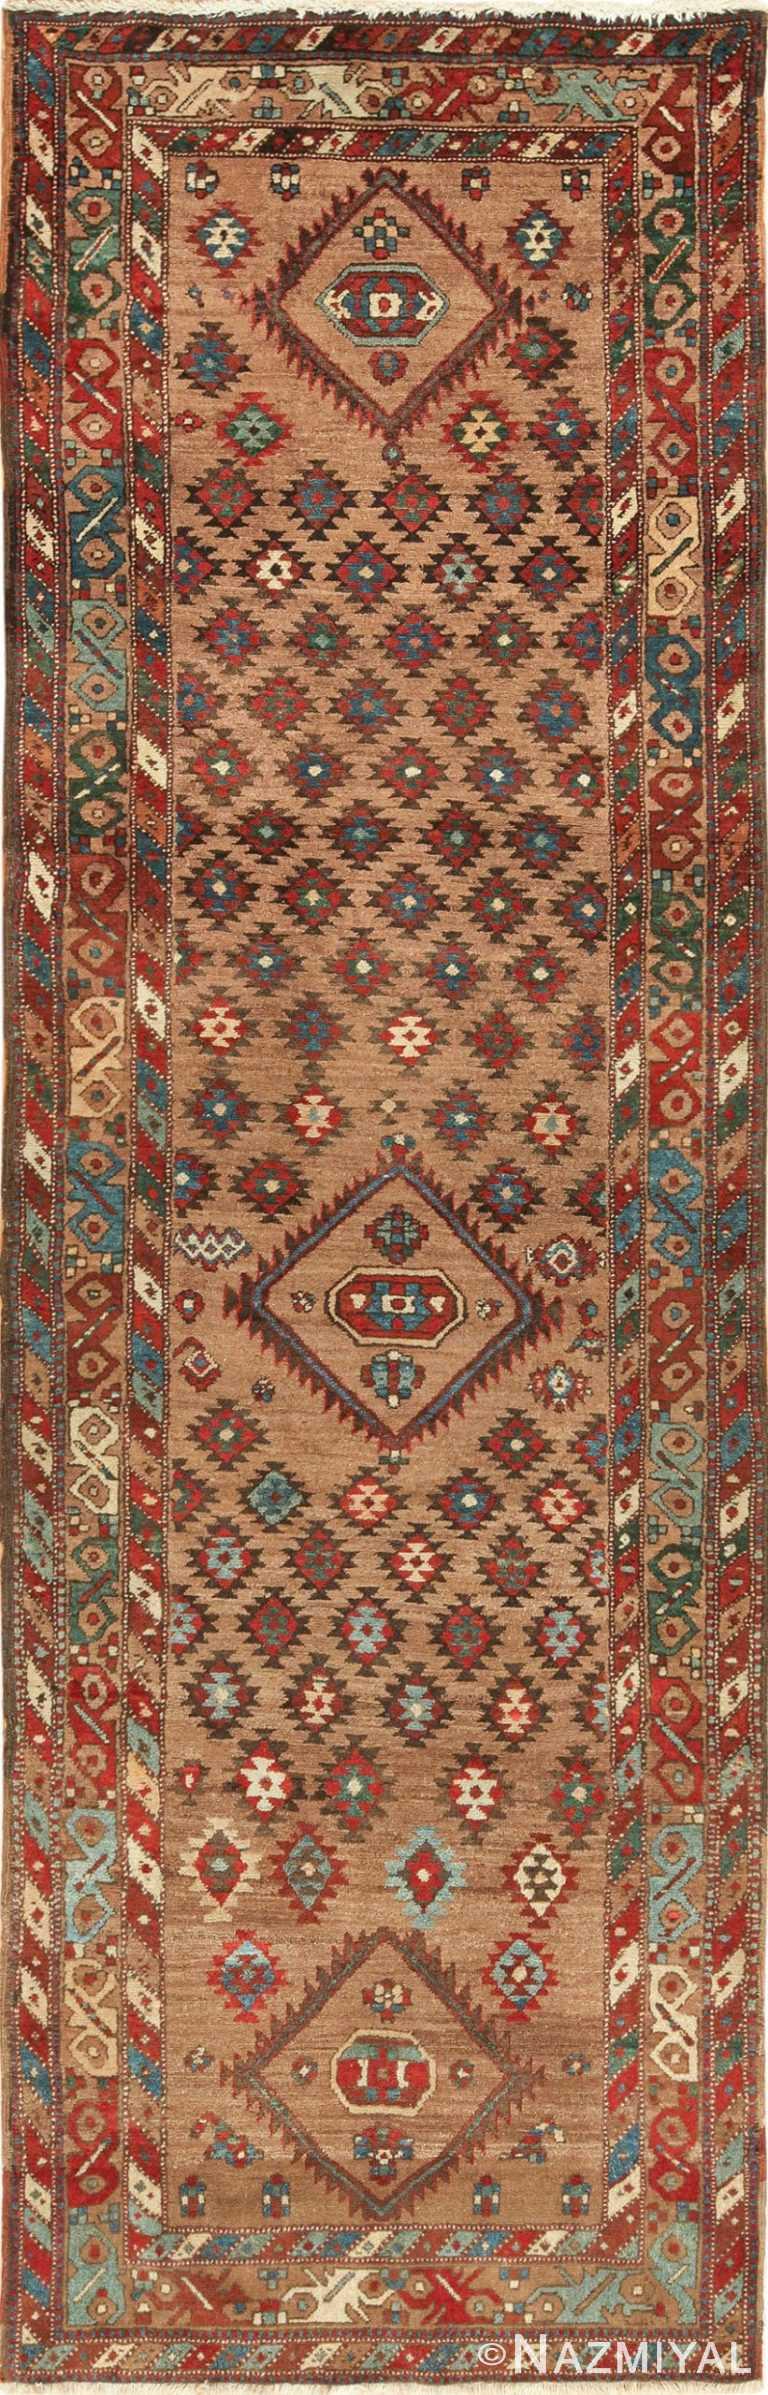 Tribal Antique Persian Bakshaish Runner Rug 49712 by Nazmiyal